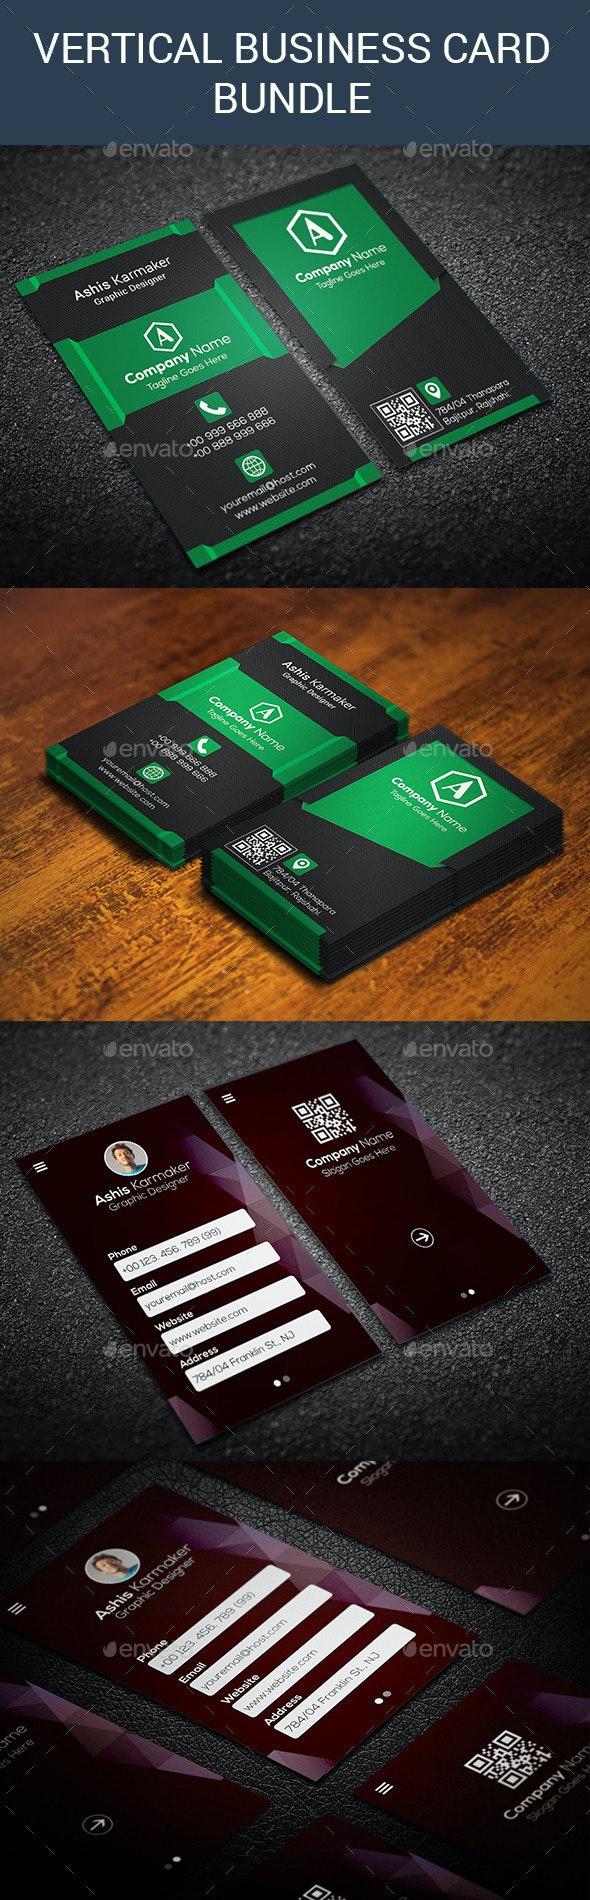 Bundle Vertical Business Card - Creative Business Cards